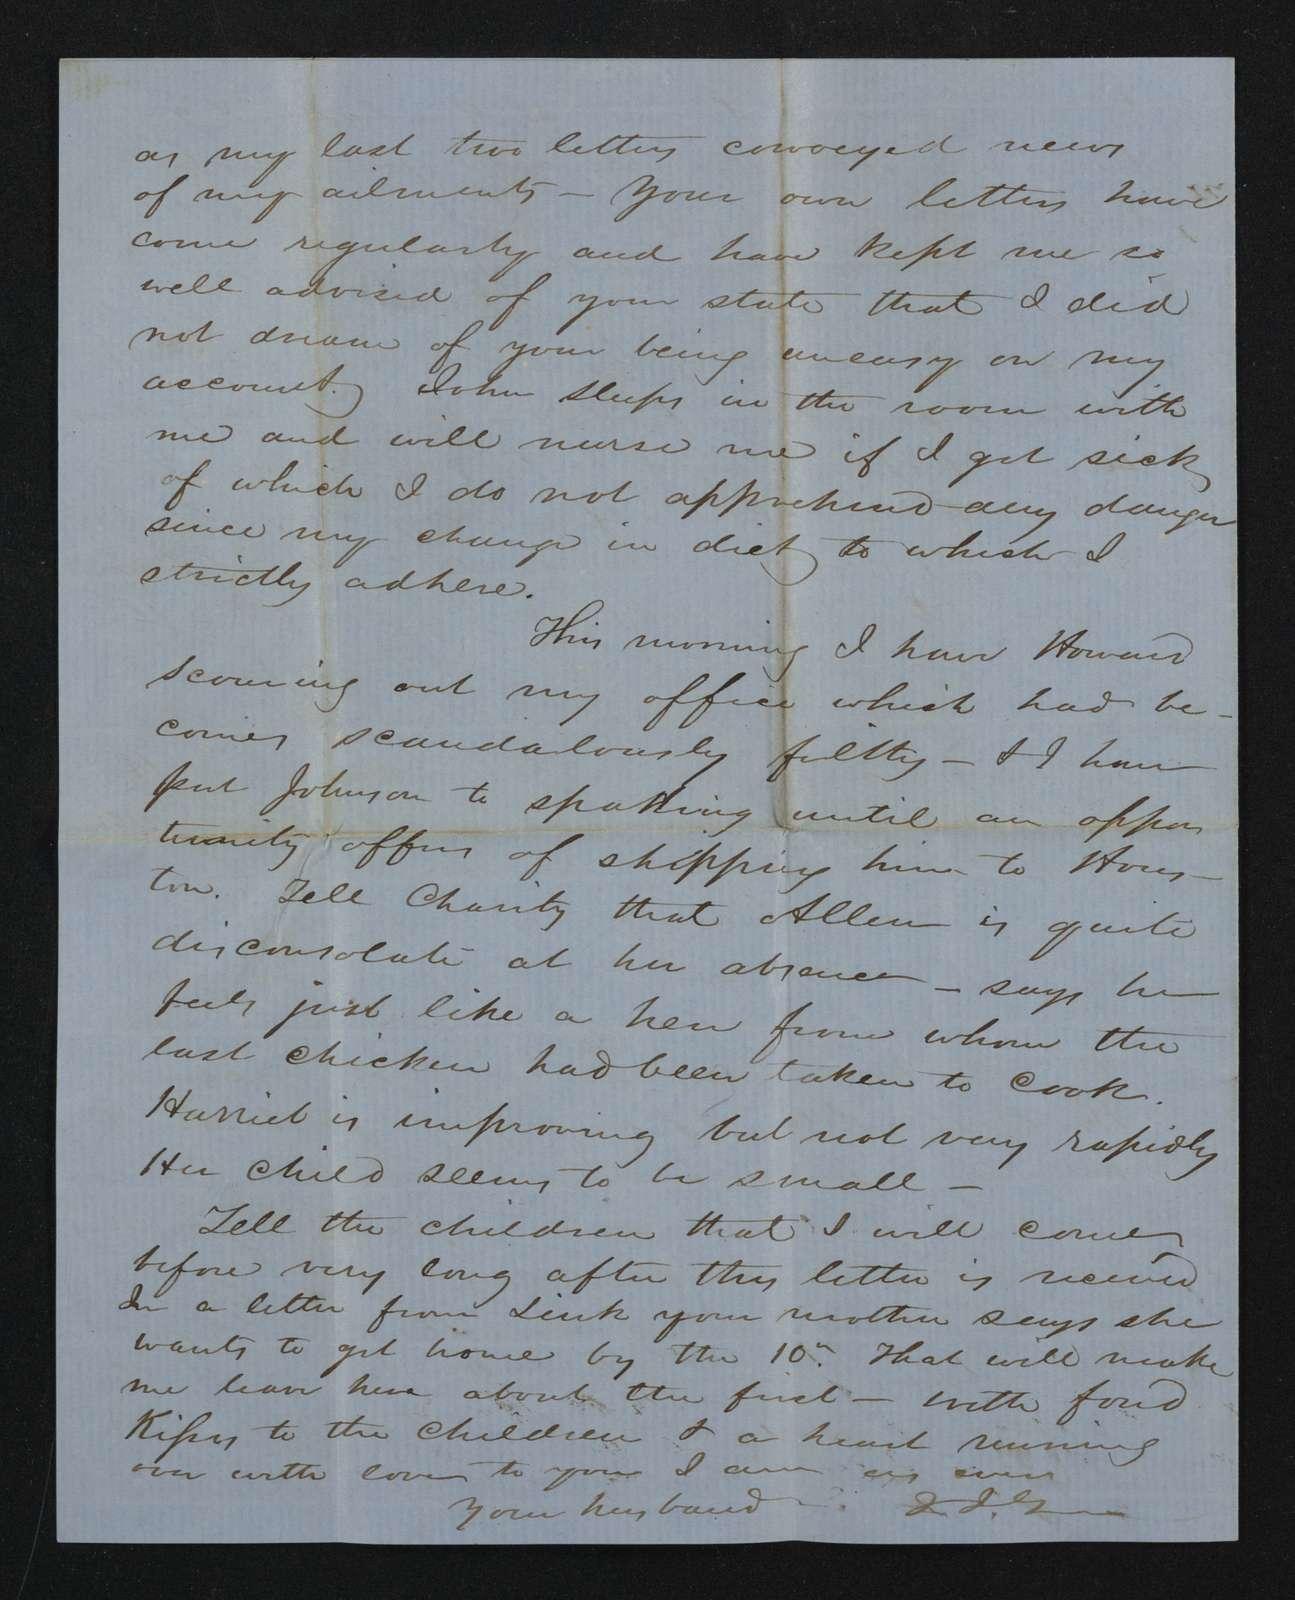 Lewis H. Machen Family Papers: Gresham Family Correspondence, 1834-1925; 1852-1854